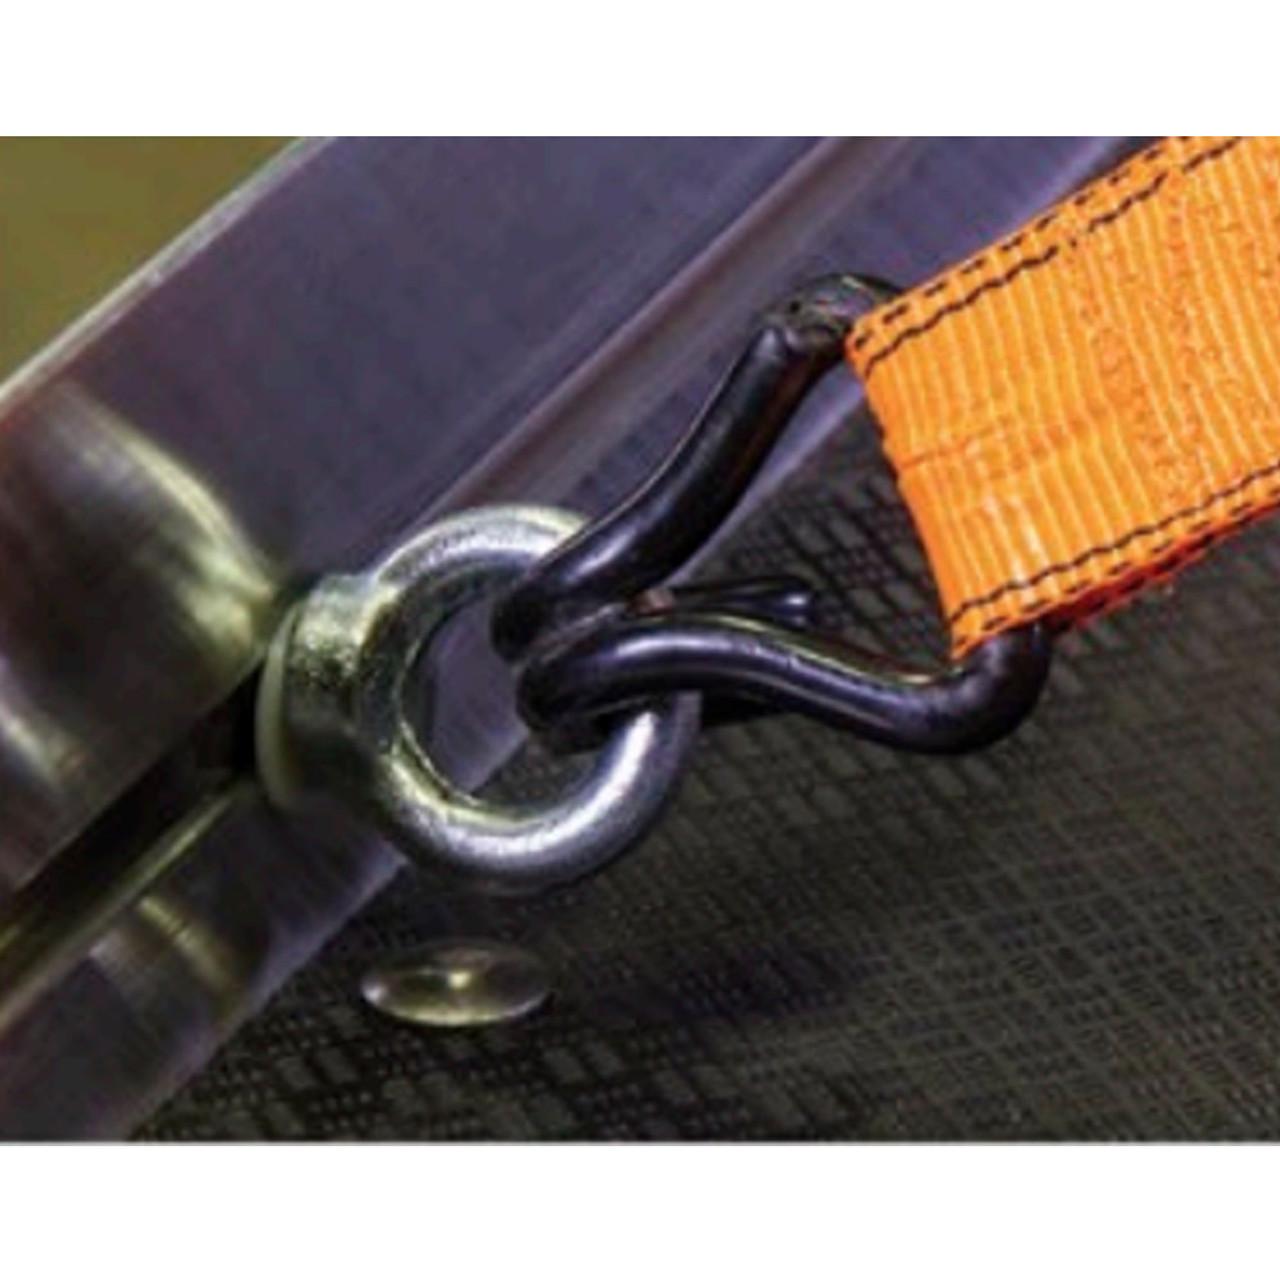 Cargo-Glide CGCTTD-4  CargoTrack - Adjustable Sliding Tie Down EyeBolt Attachments (Set of 4)